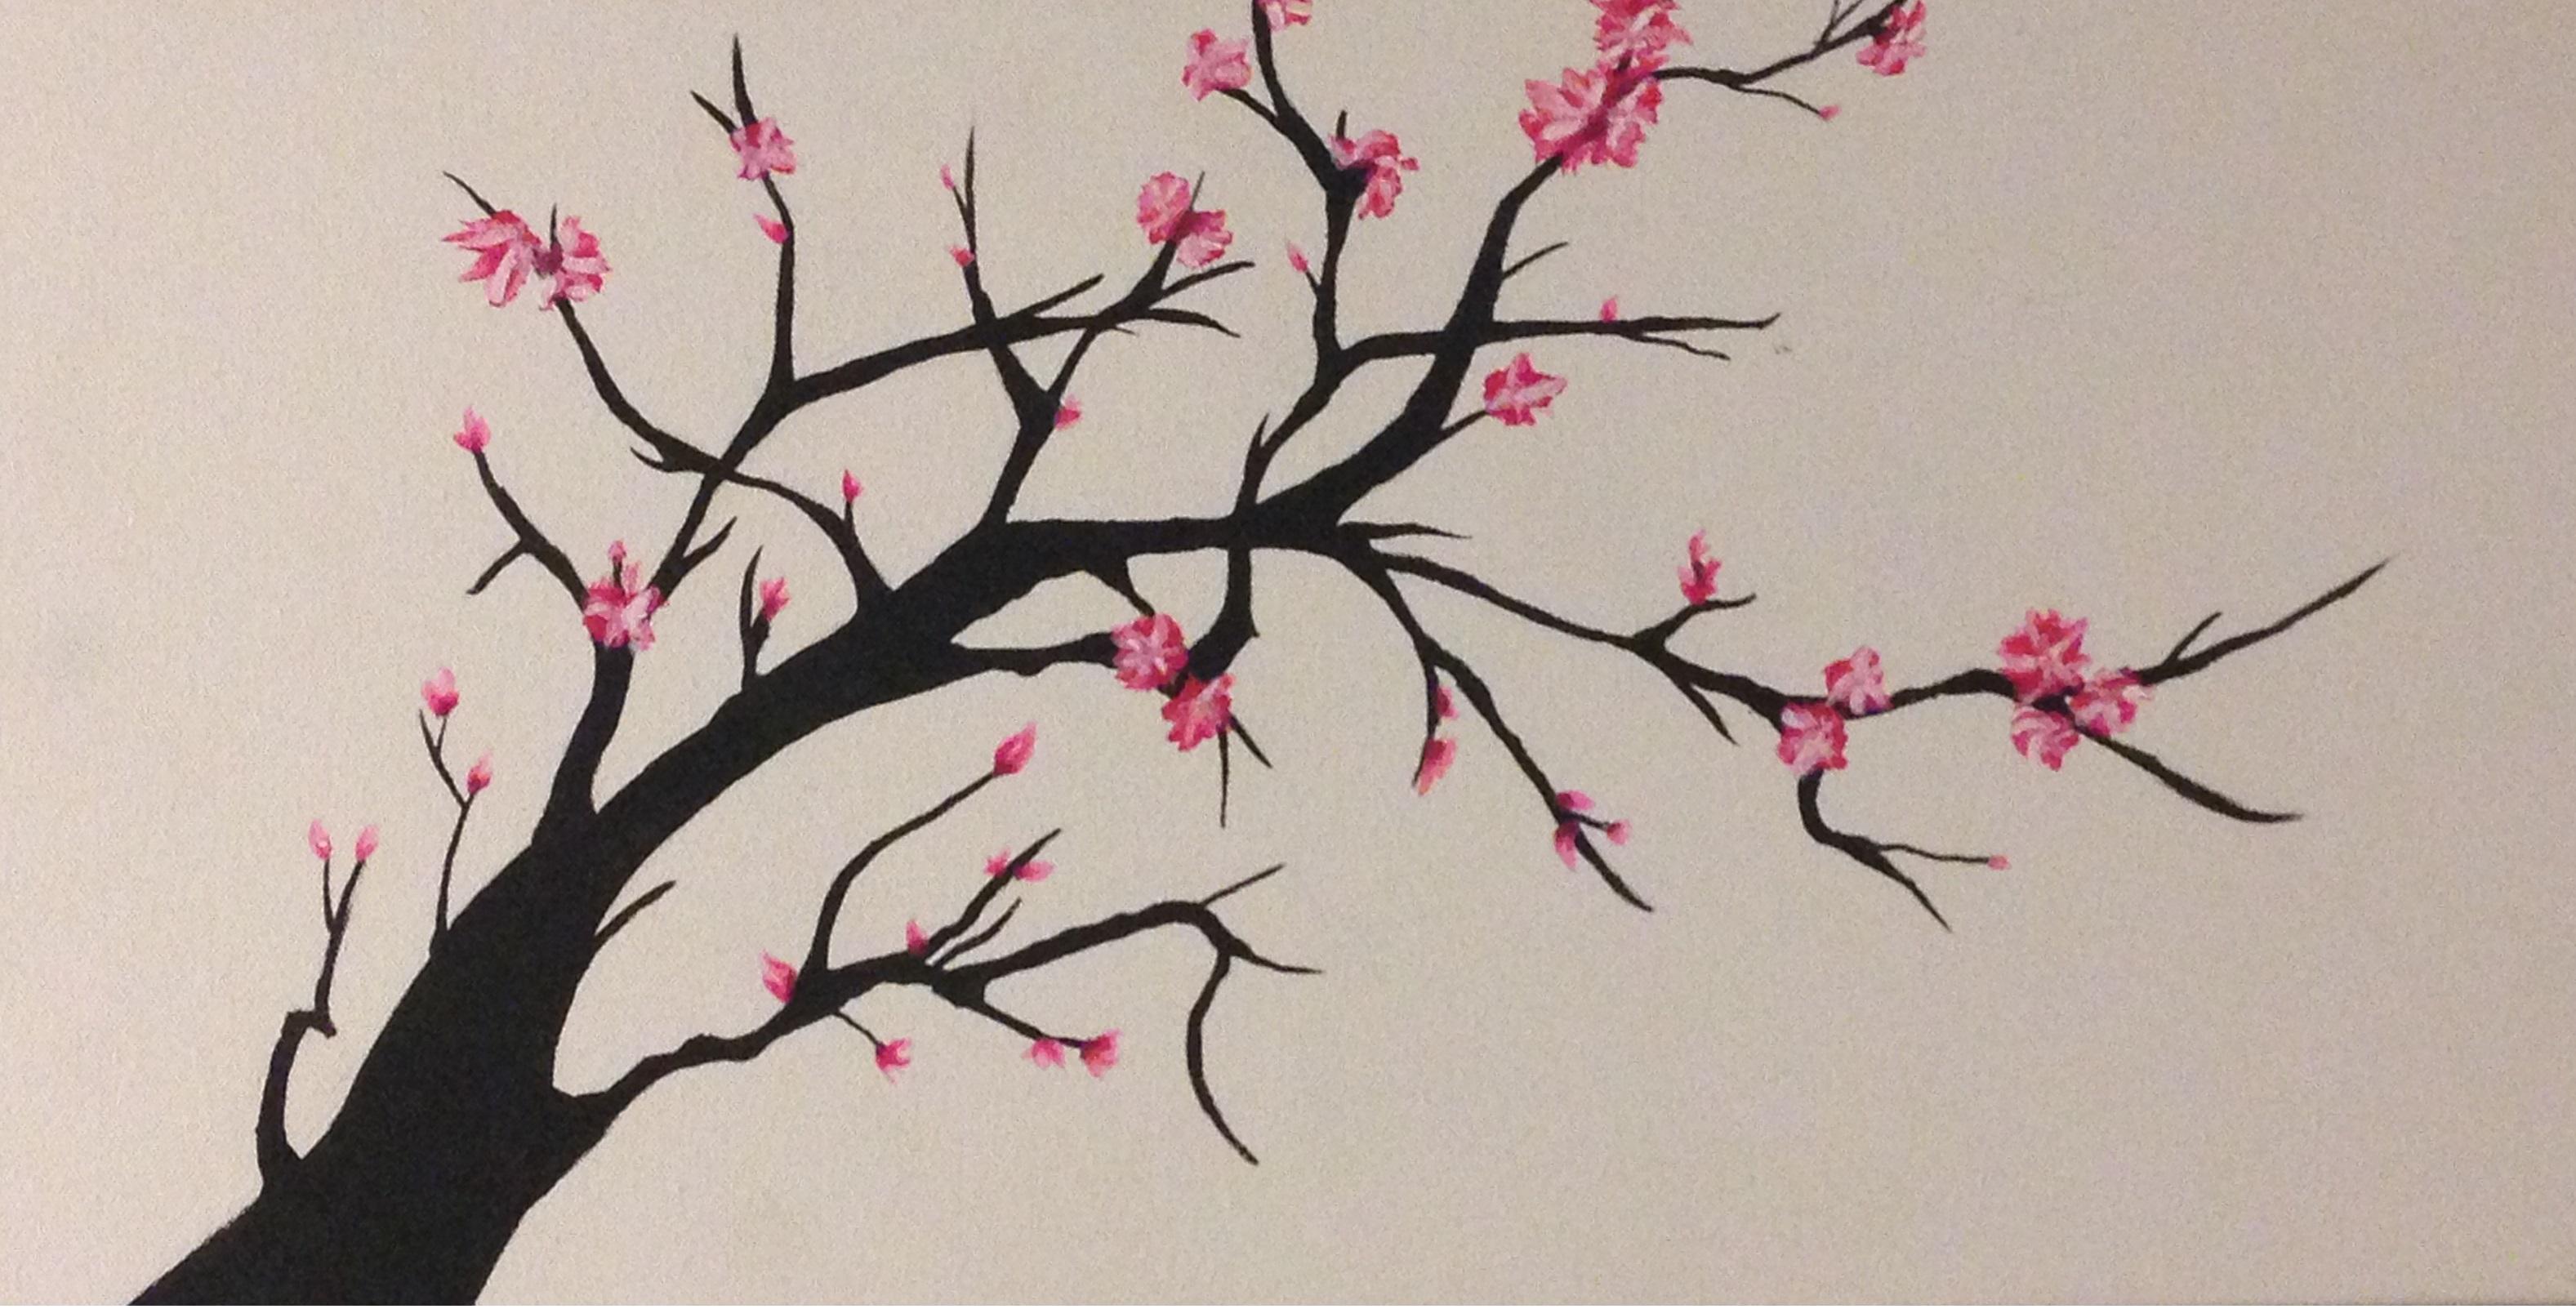 Drawn tree cherry blossom tree Drawing Blossom Tree Tree Easy